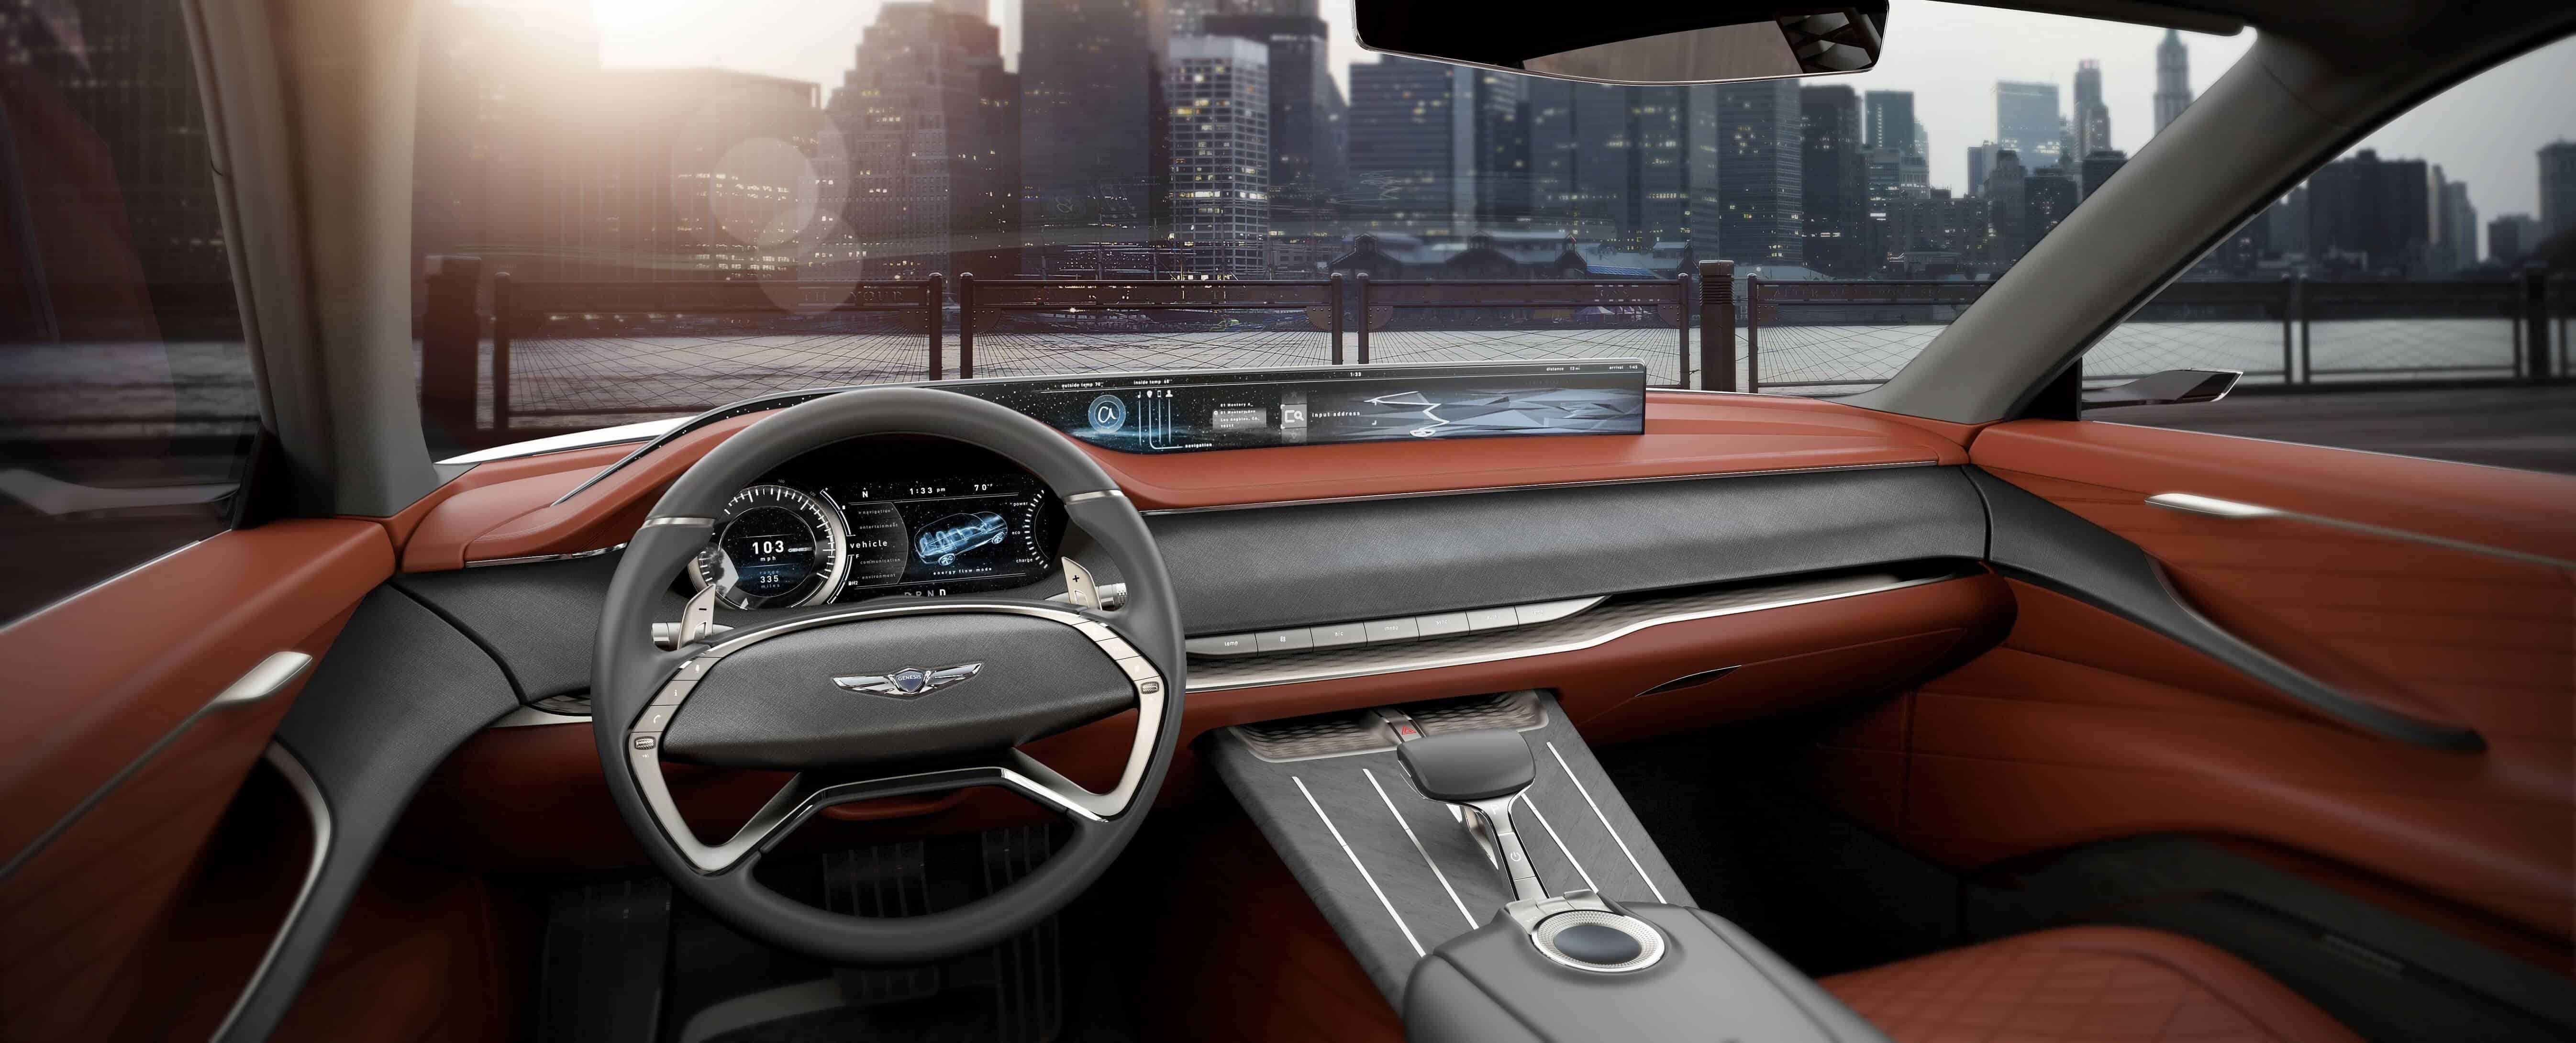 Genesis GV80 Concept Car Interior